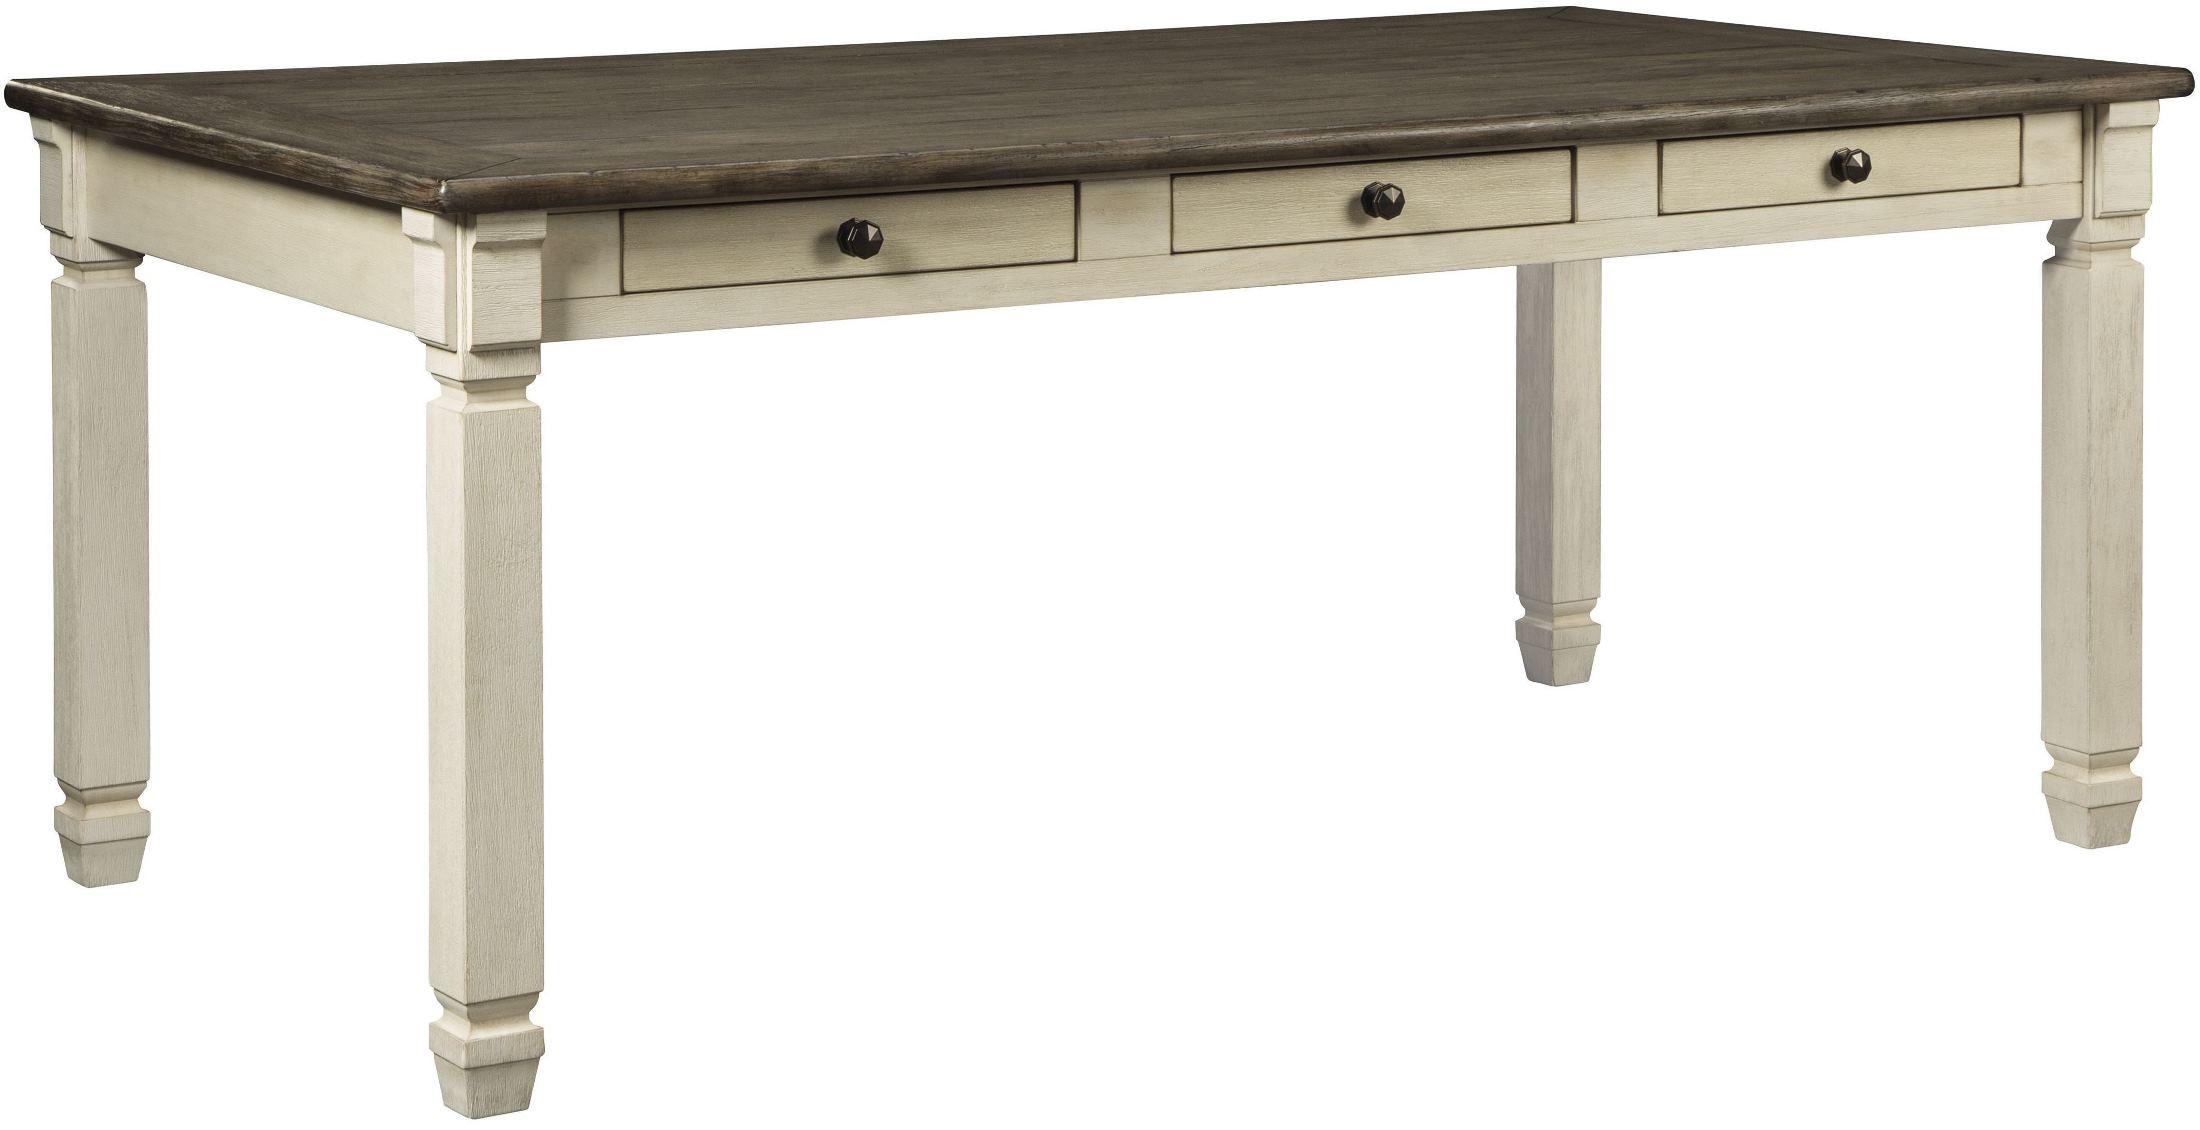 Bolanburg White And Gray Rectangular Dining Table, D647-25